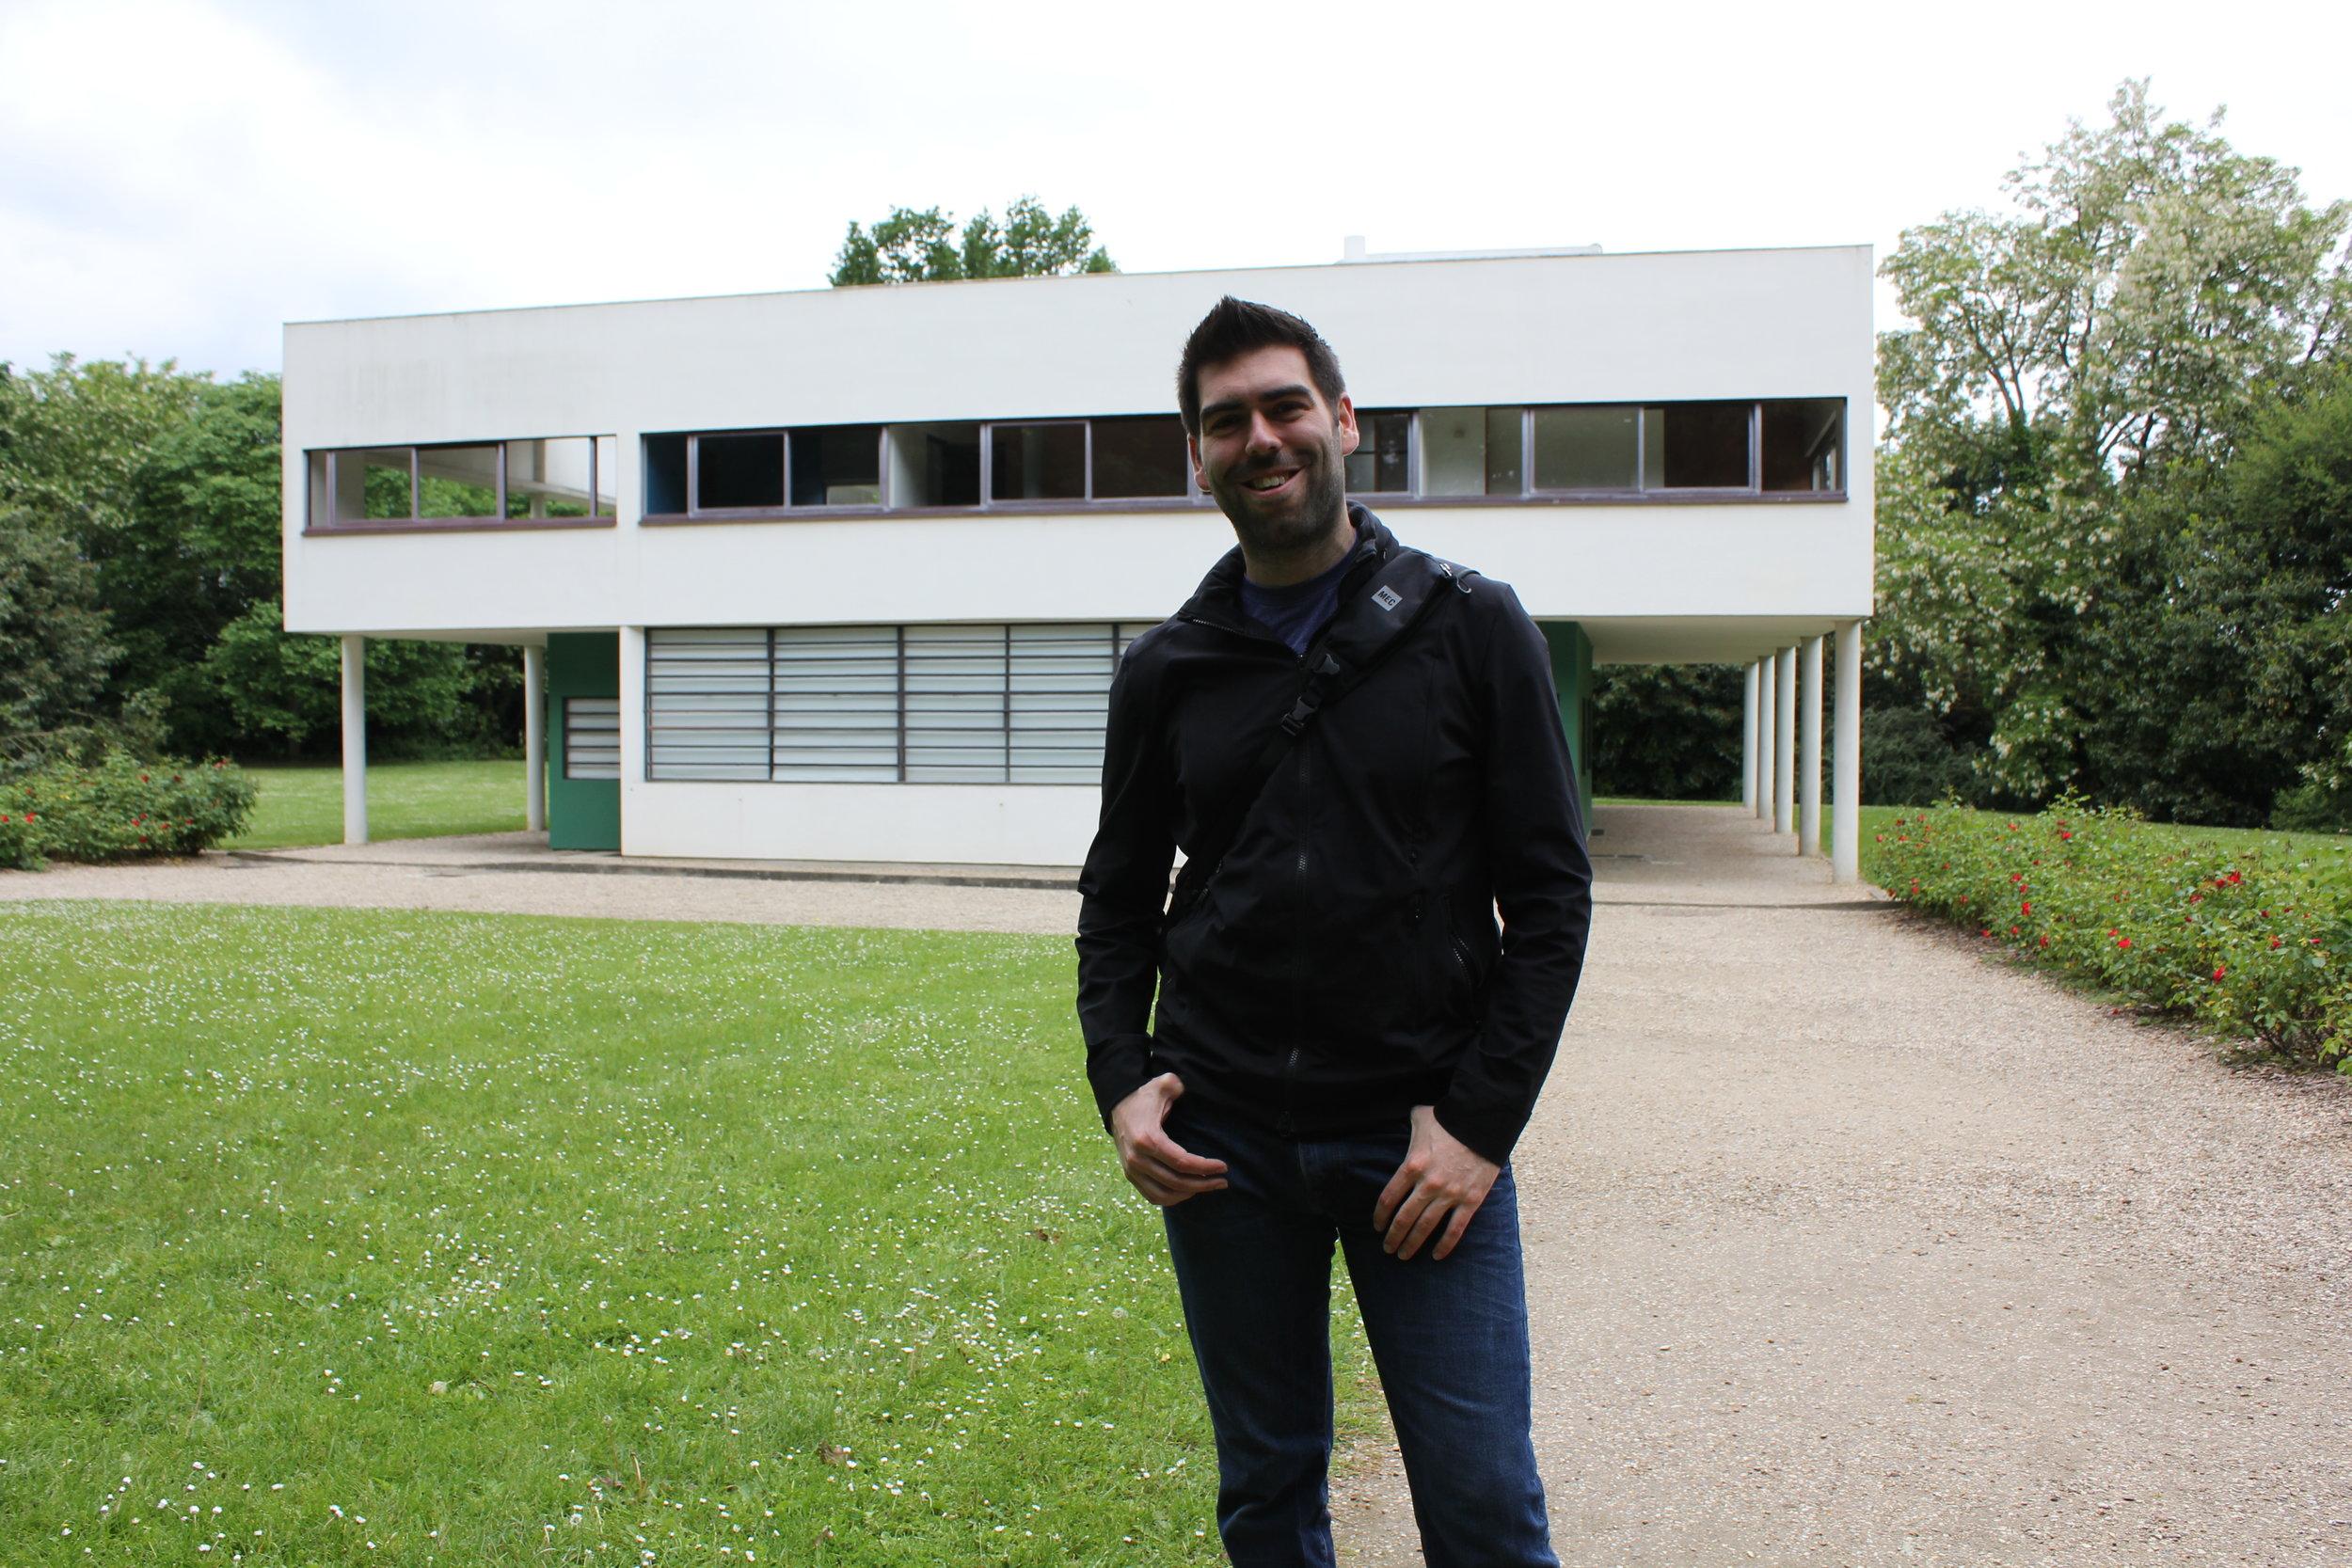 Tom Jenson at Villa Savoye